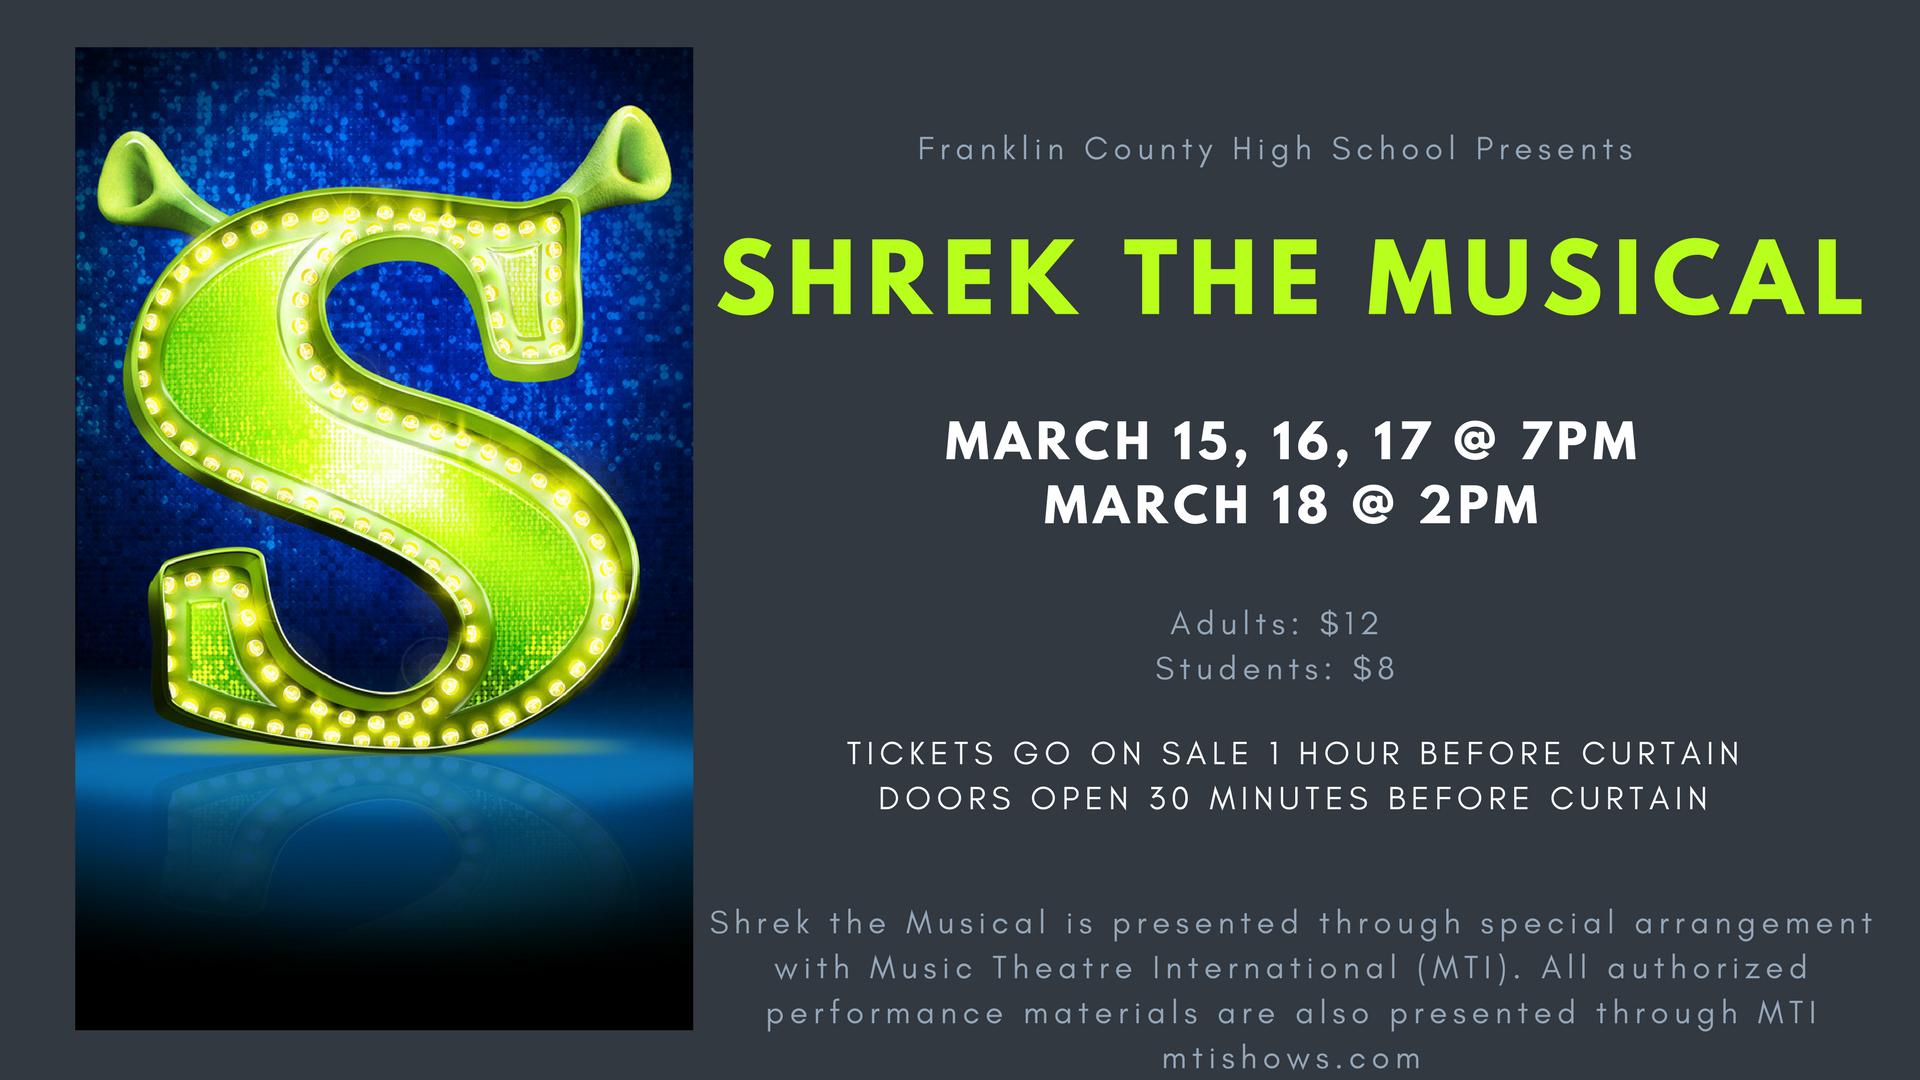 Shrek the Musical March 15-18